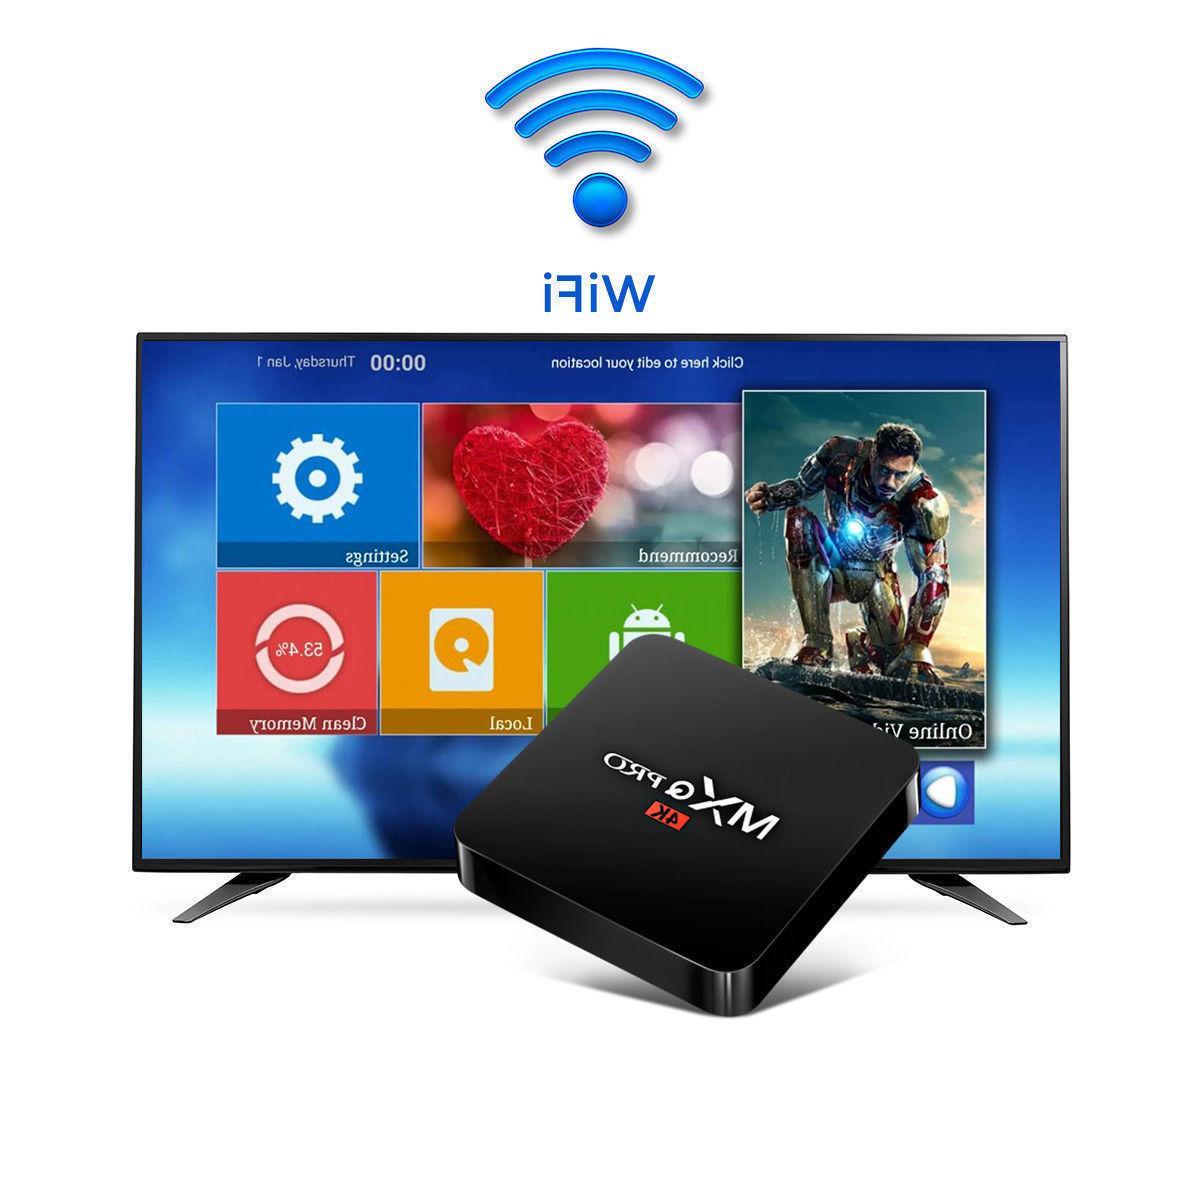 MXQ Pro Android 7.1 Smart TV Box Quad HDMI